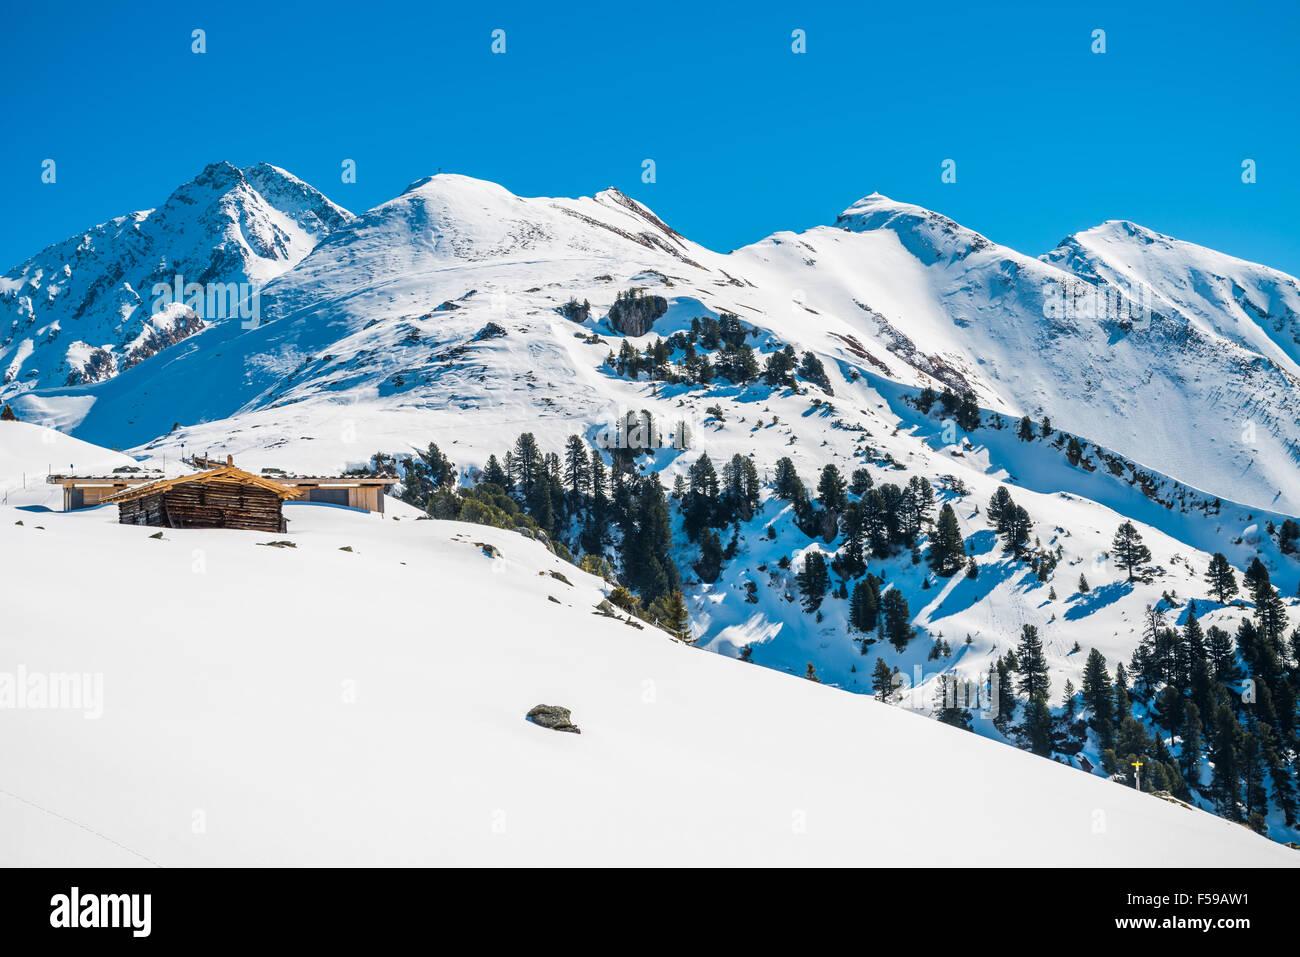 Austrian Alps in the winter, Mayrhofen ski resort - panoramic view - Stock Image